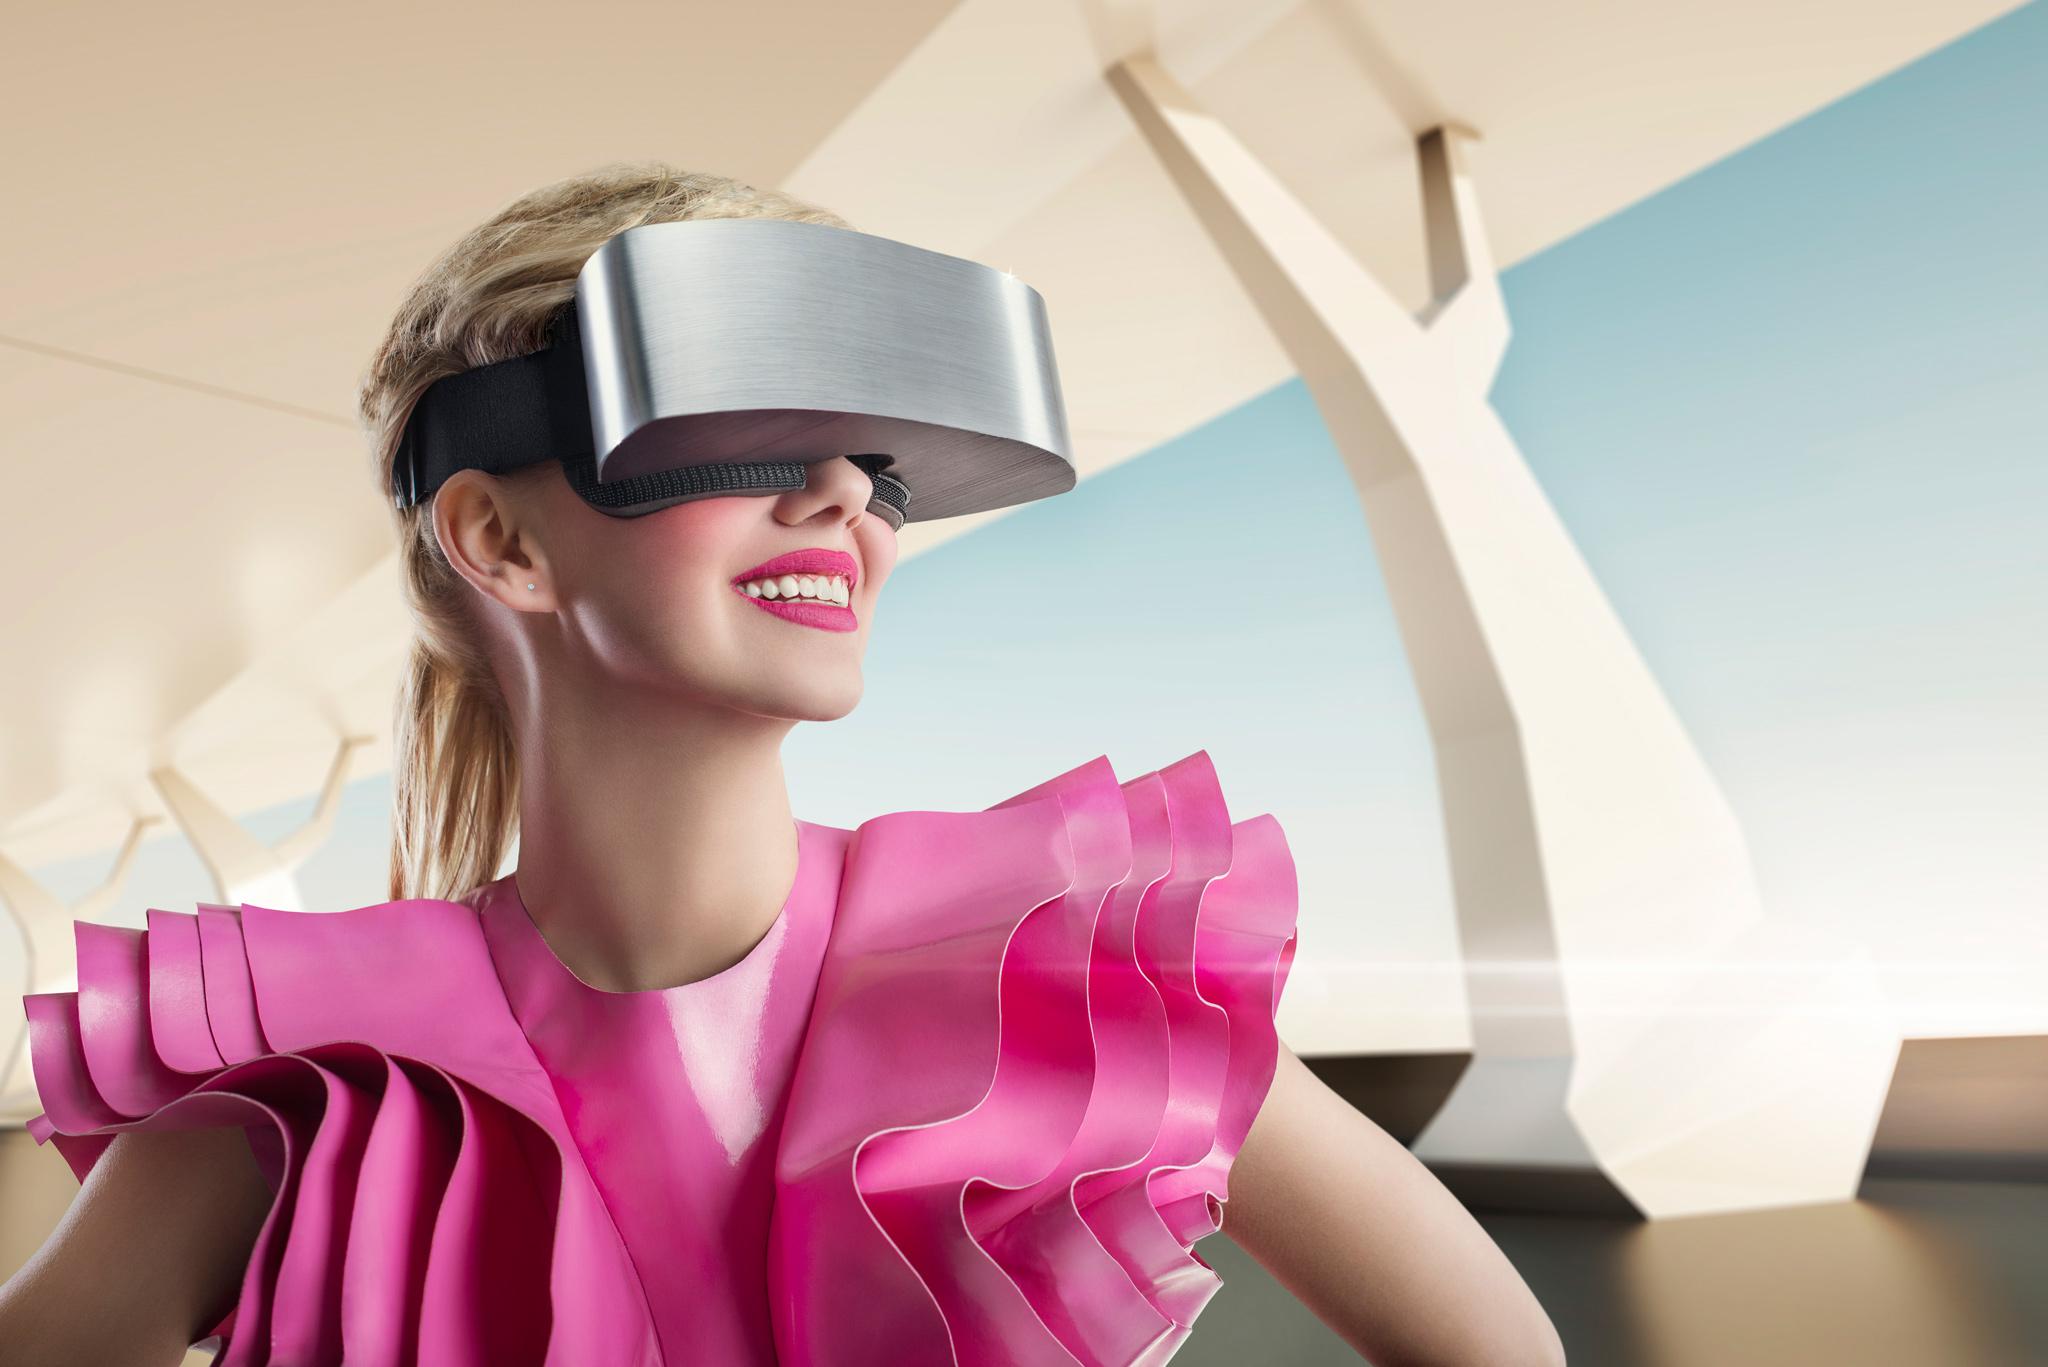 VR Union Claire headset